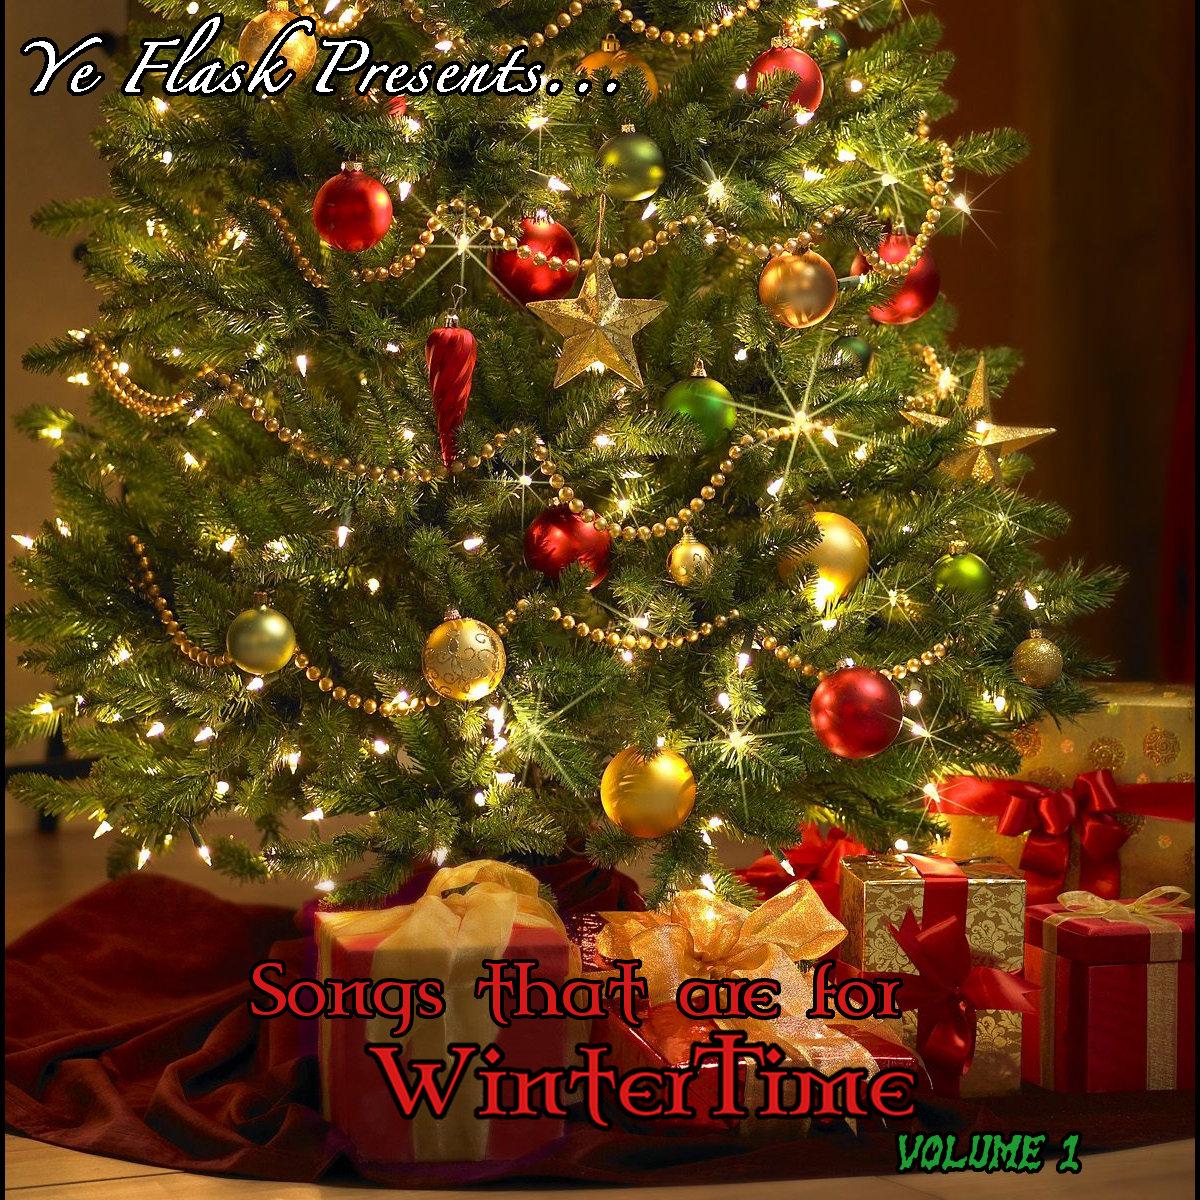 Jingle Bells Christmas Hip Hop Remix 2011 Mp3 Download - MP3views